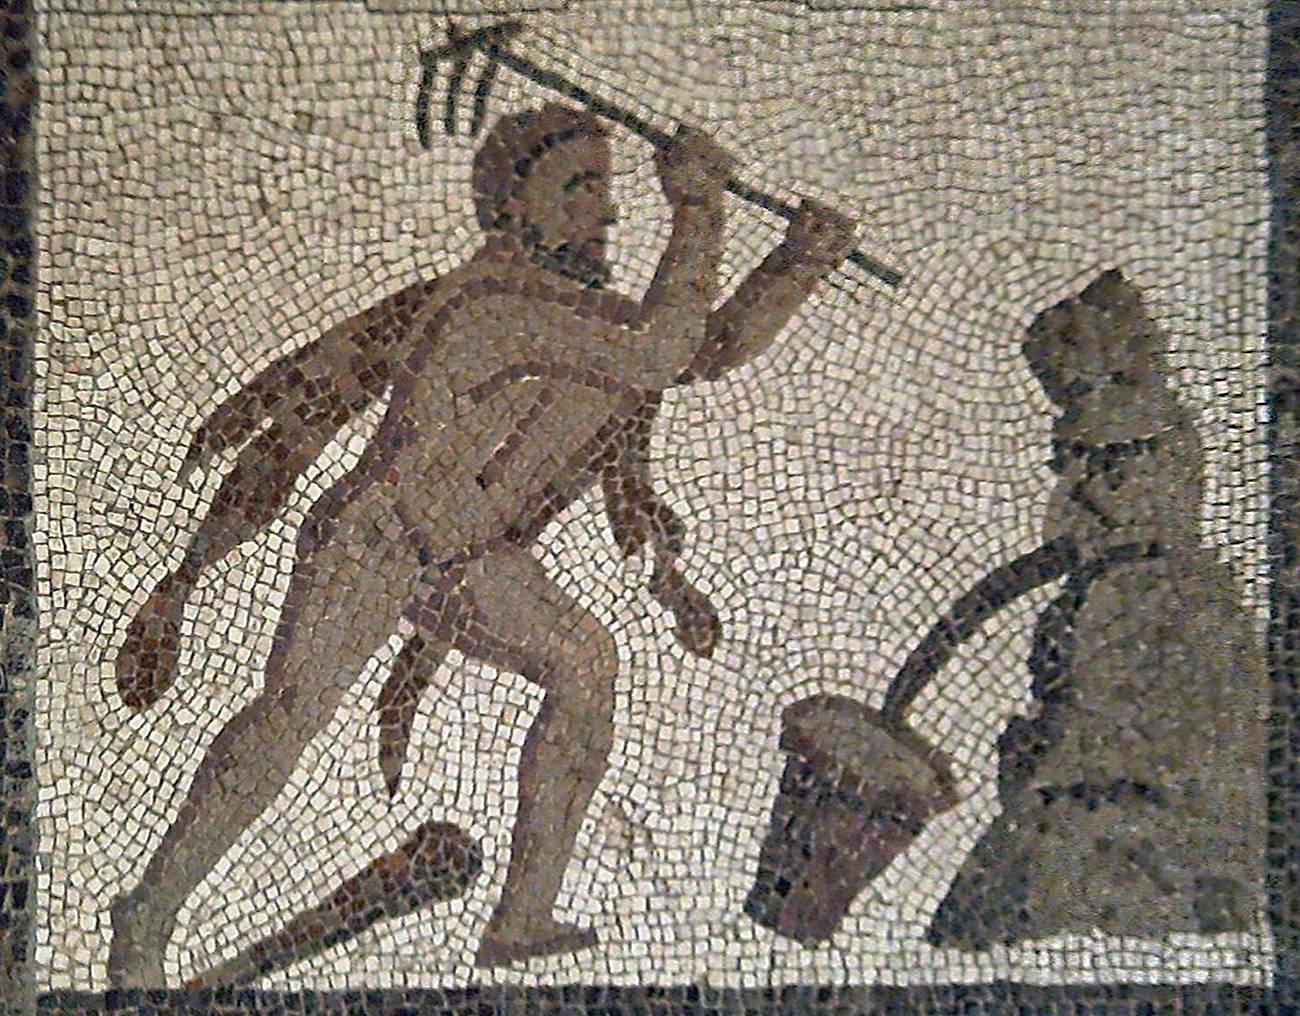 Геракл, очищающий Авгиевы конюшни. Мозаика. 200 г. н.э.